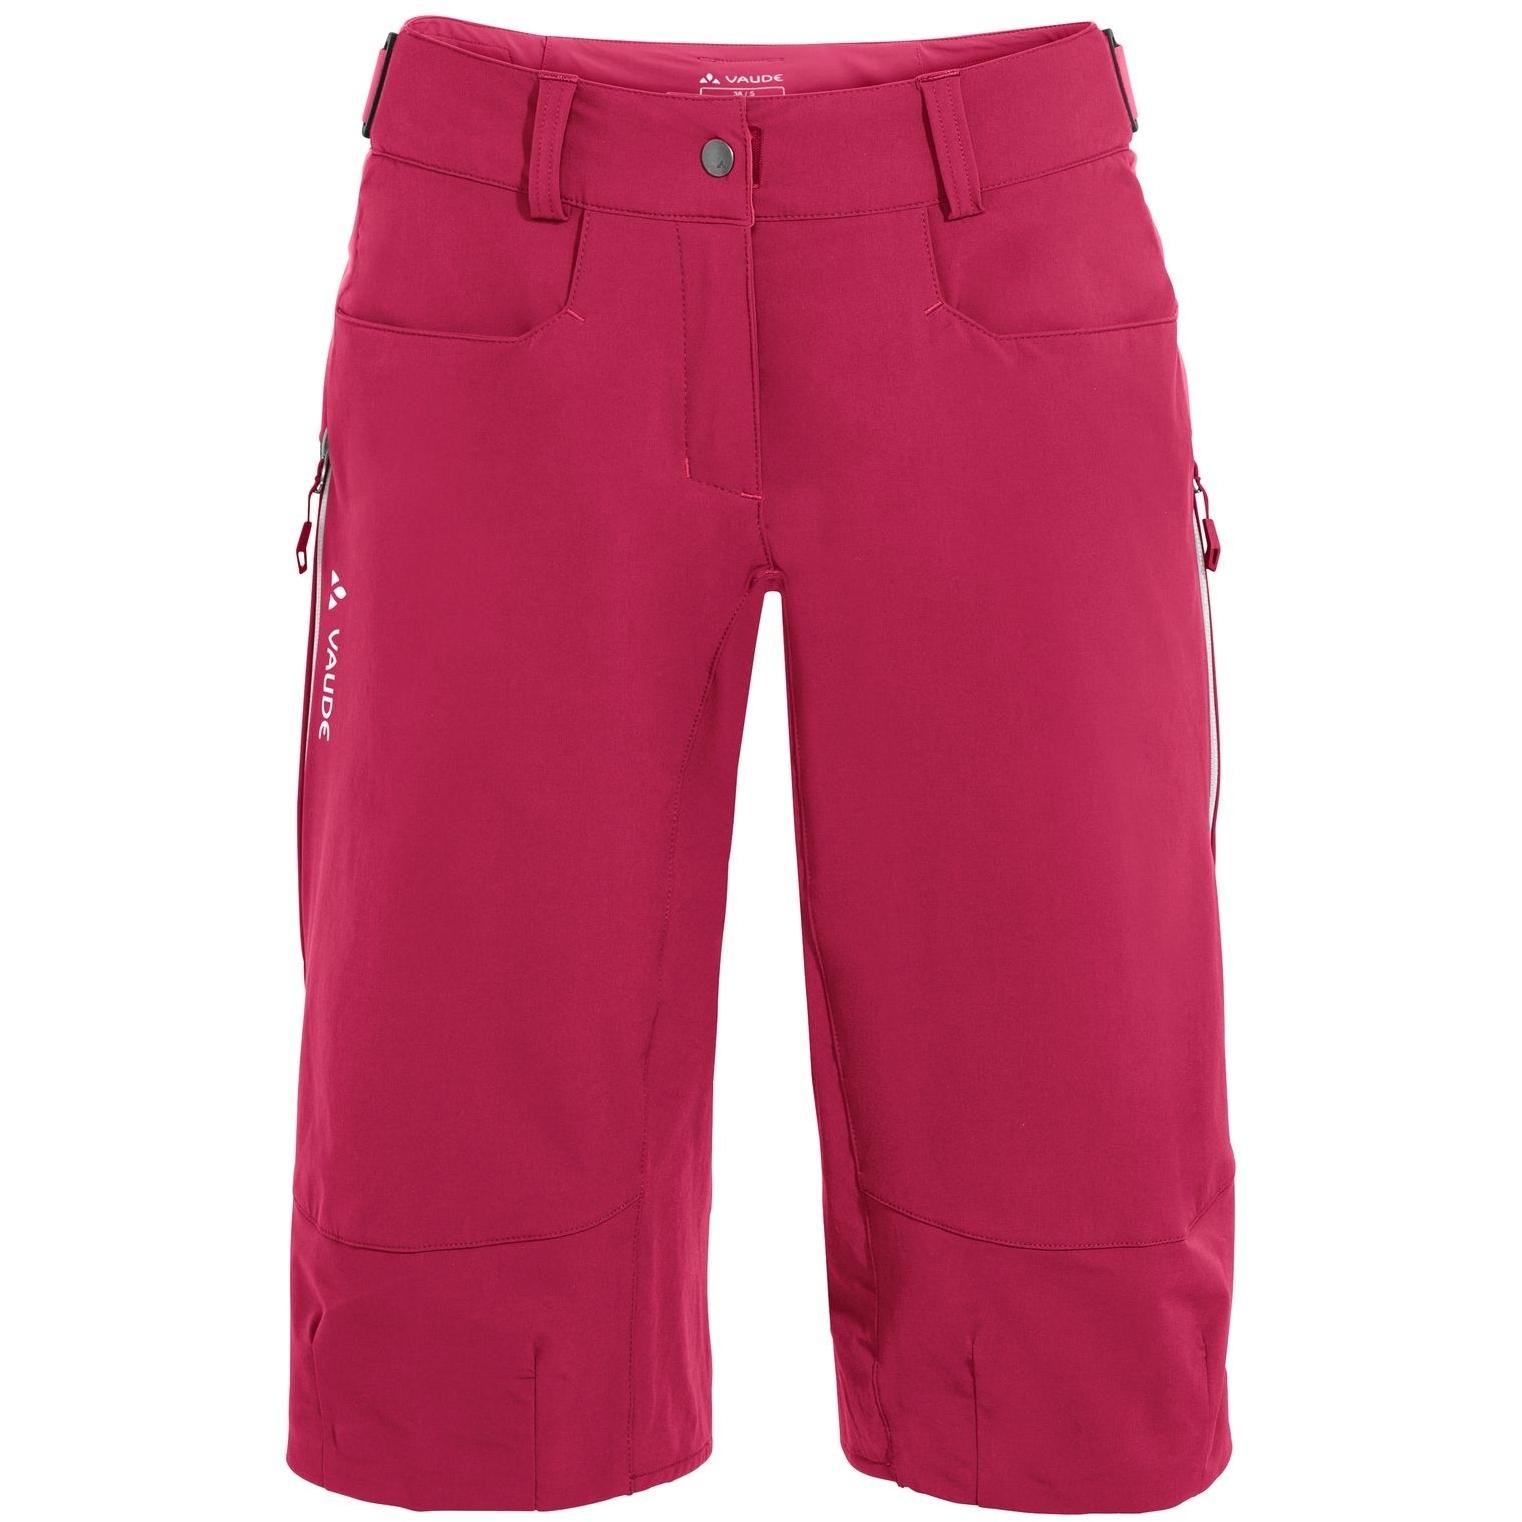 Vaude Moab IV Damen-Shorts - crimson red